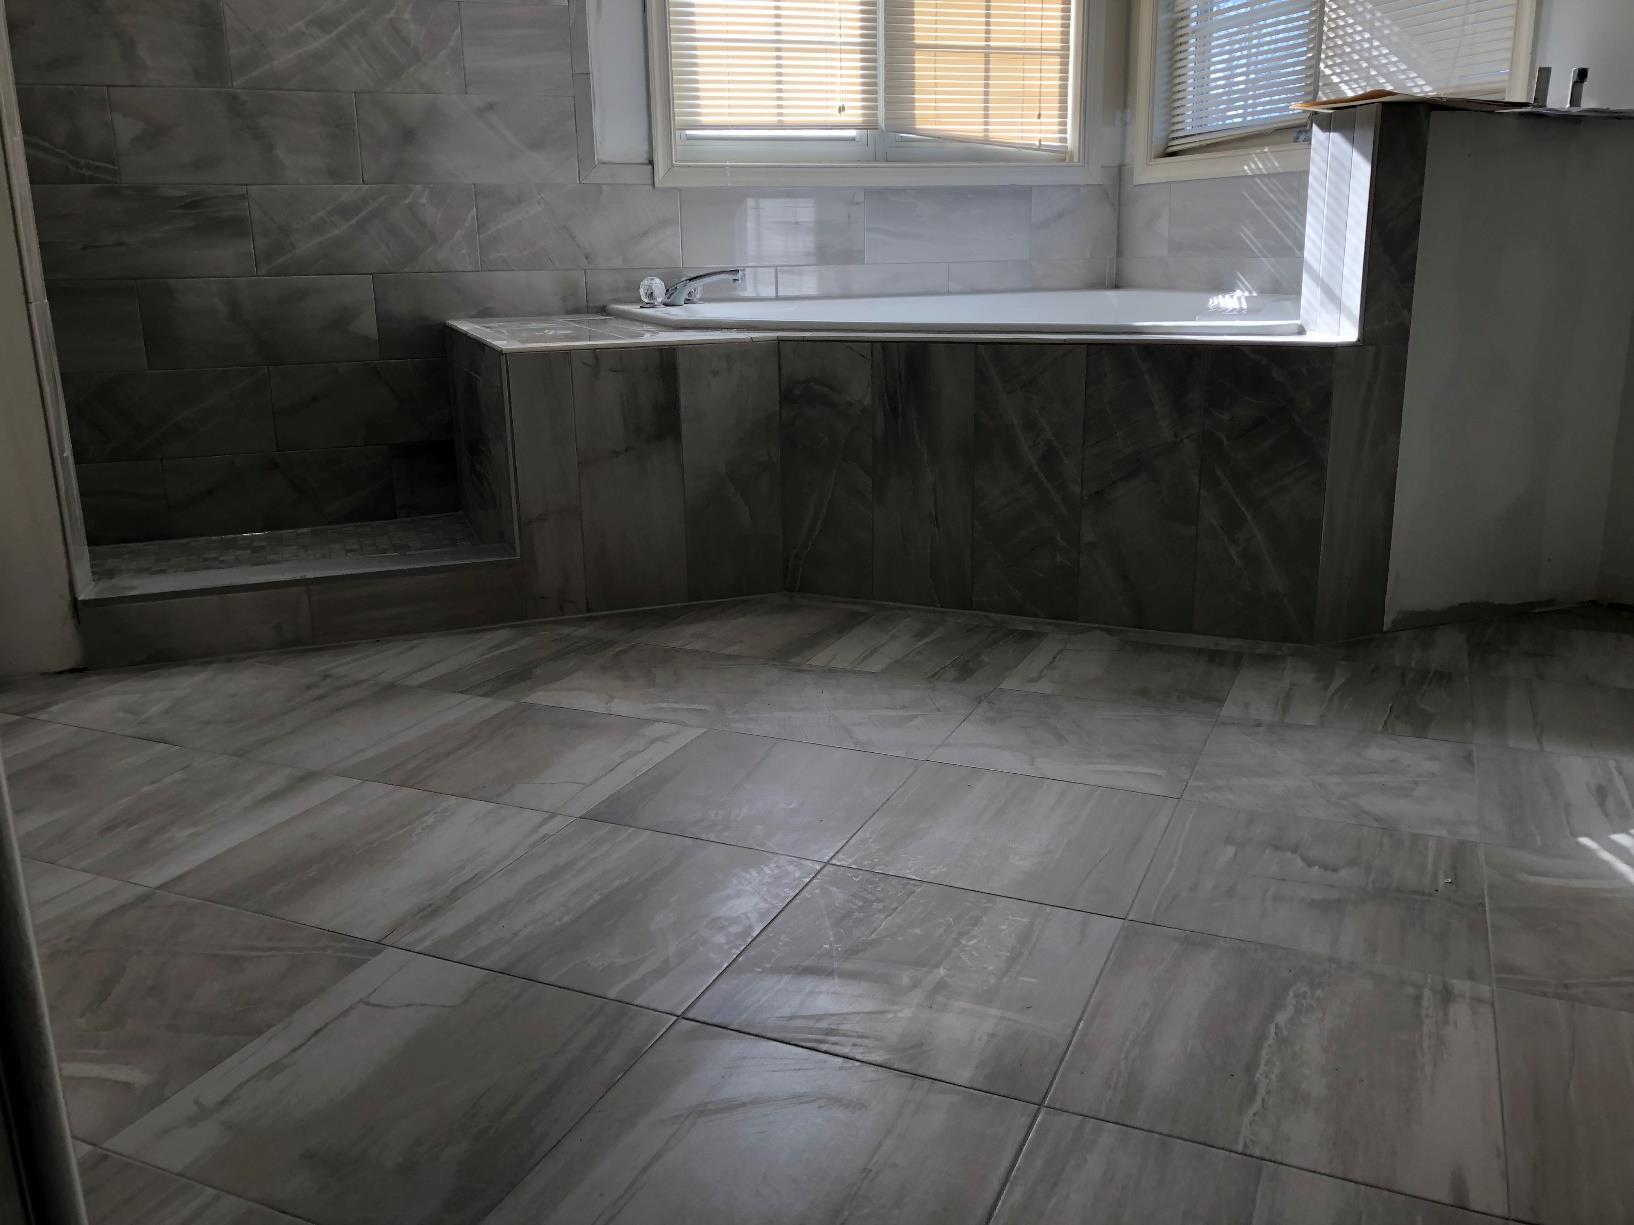 Unfinished bathroom remodeling project